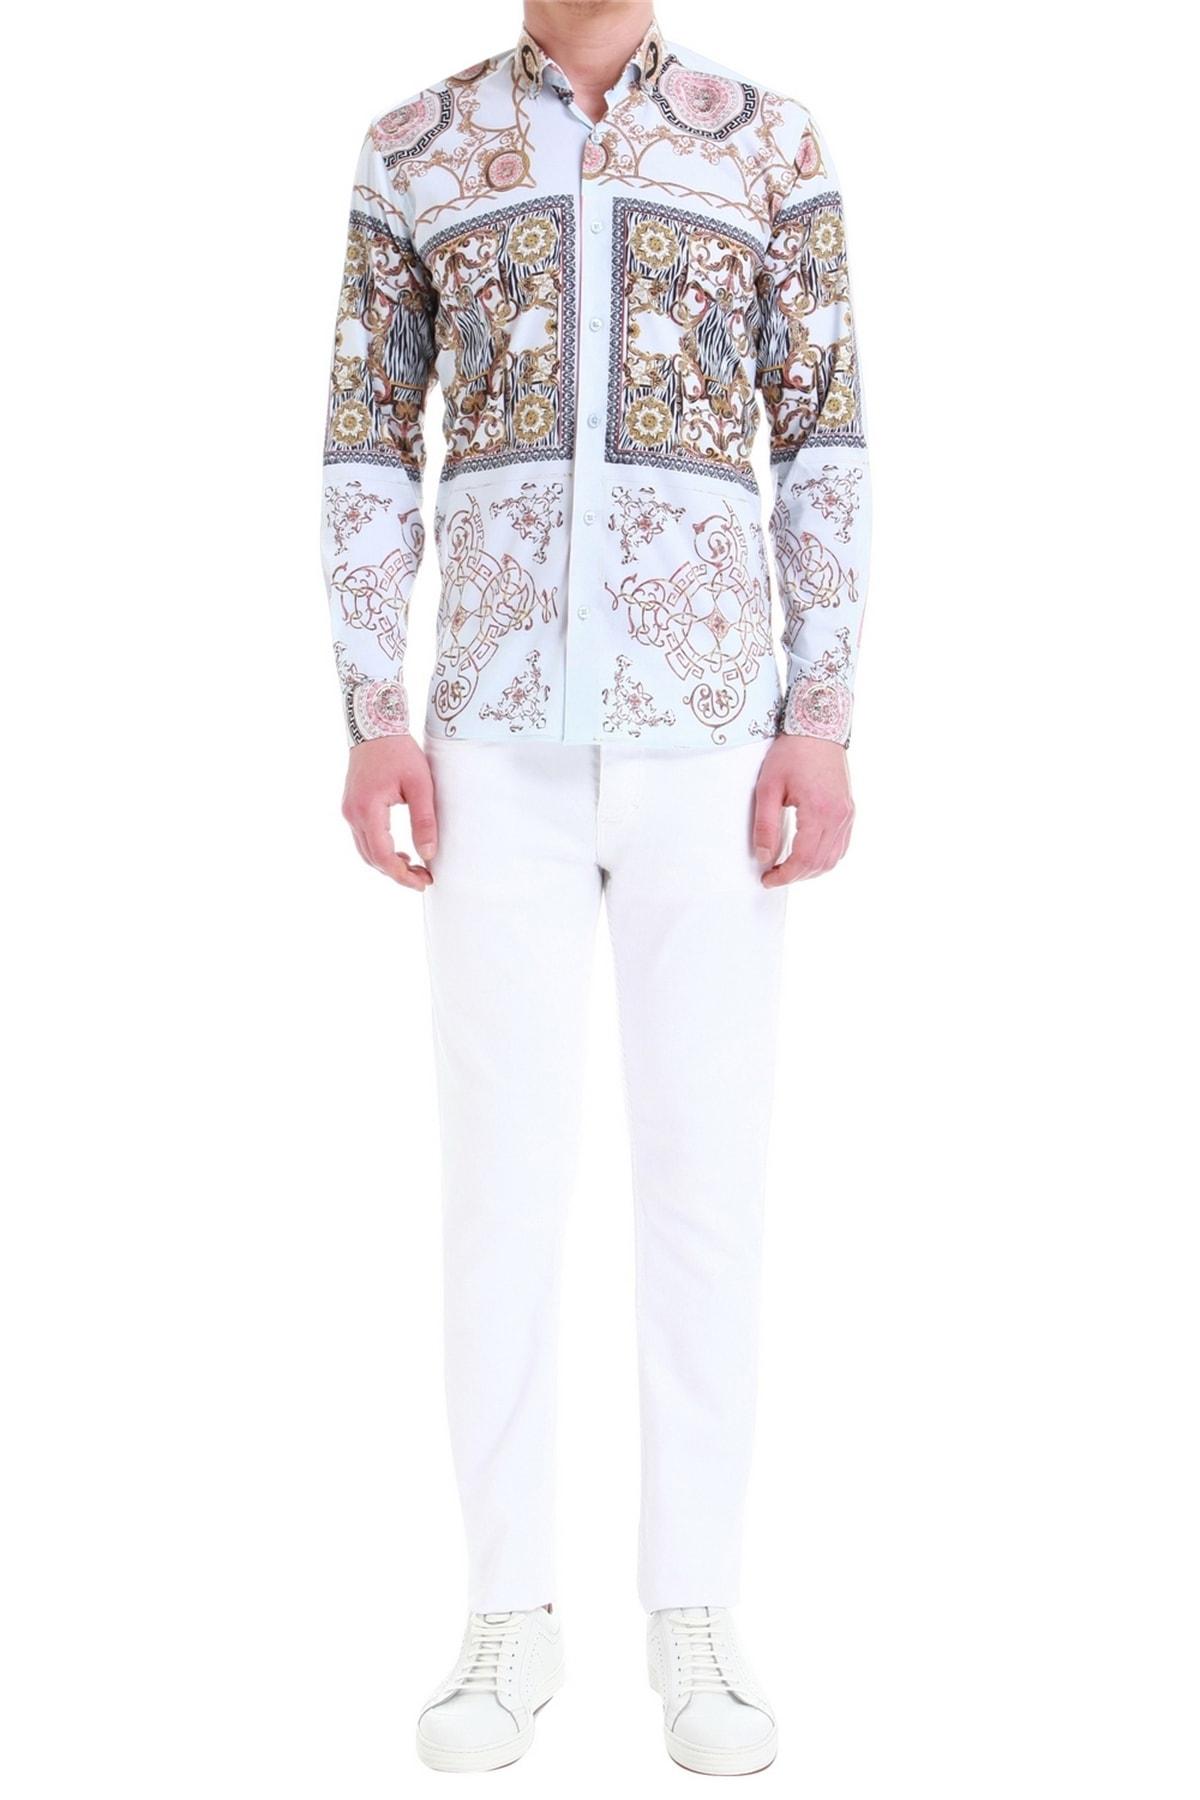 Efor 033 Slim Fit Beyaz Jean Pantolon 1